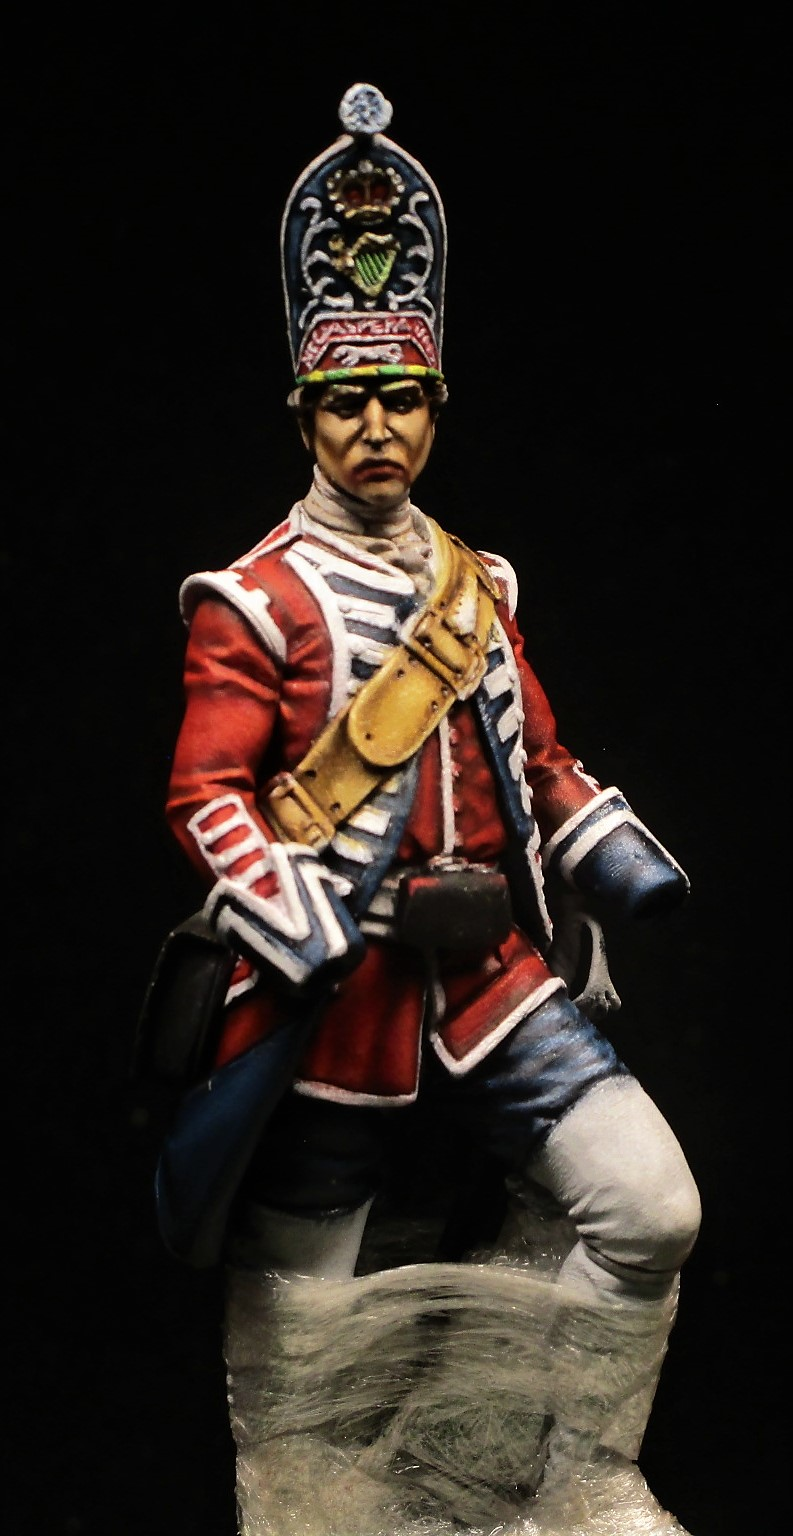 grenadier anglais du 18th Foot en 1751 Img_1112